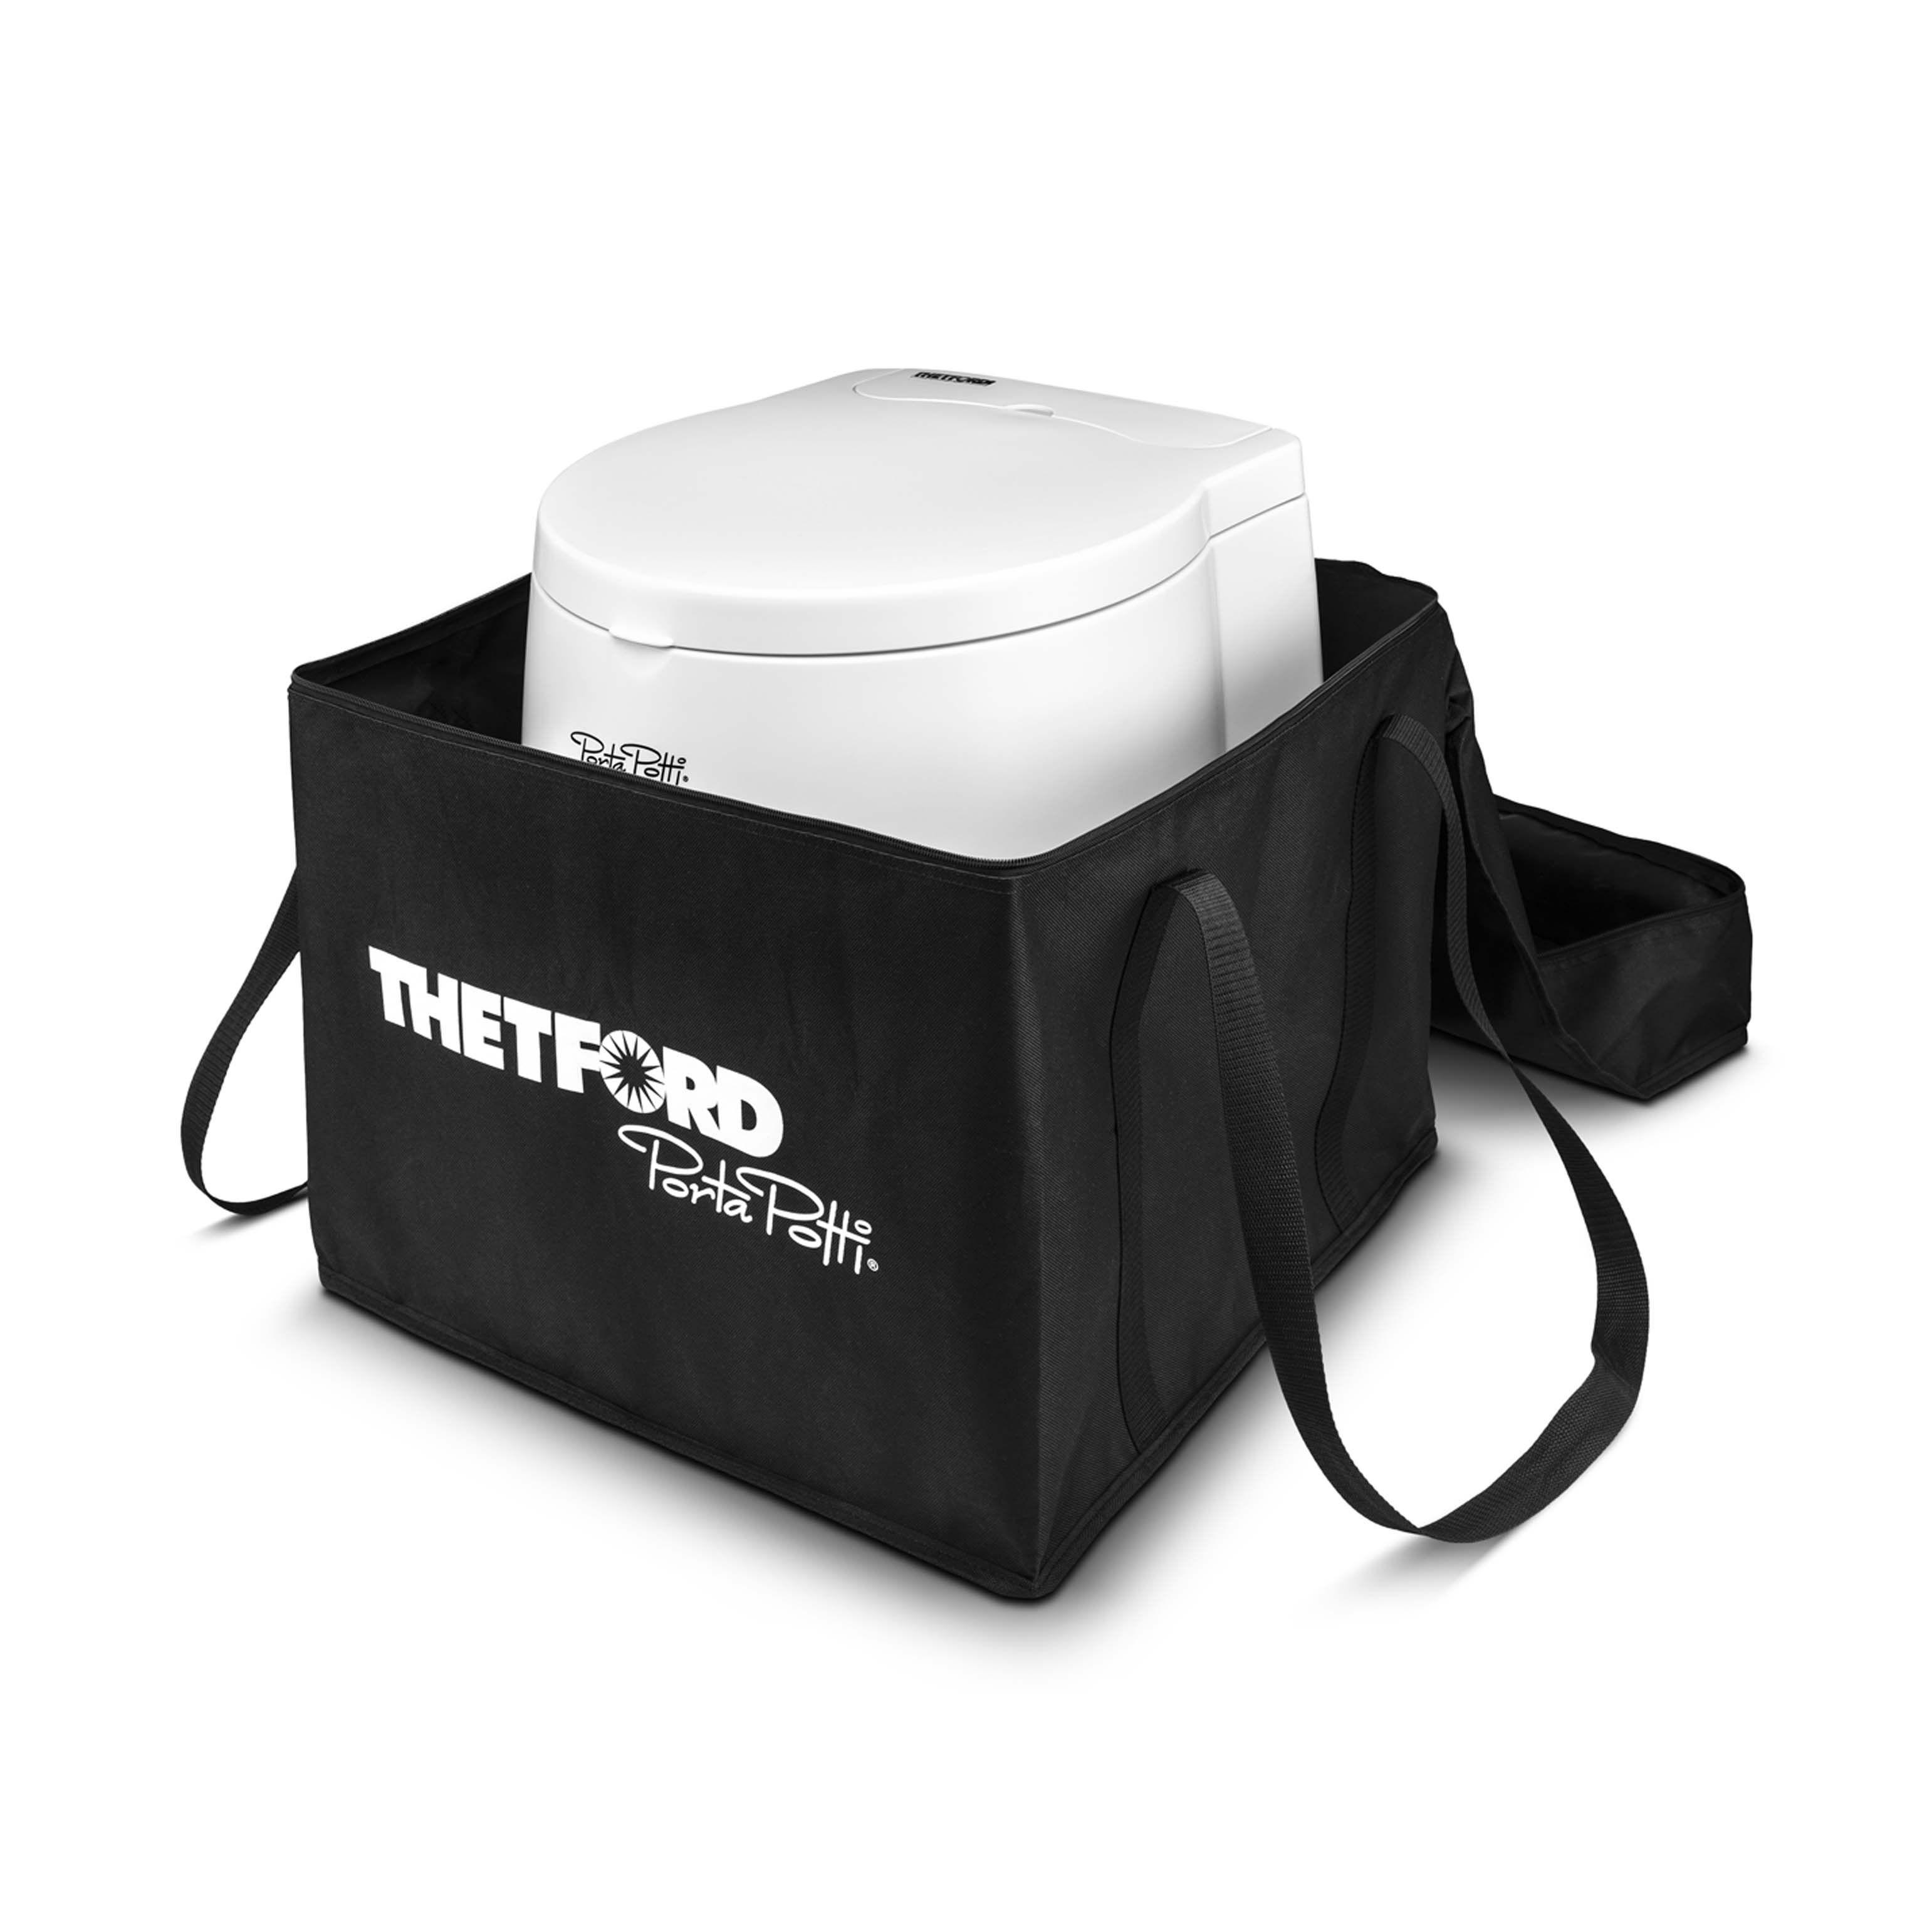 Thetford Porta Potti Carry Bag for PP 145, 335, 345